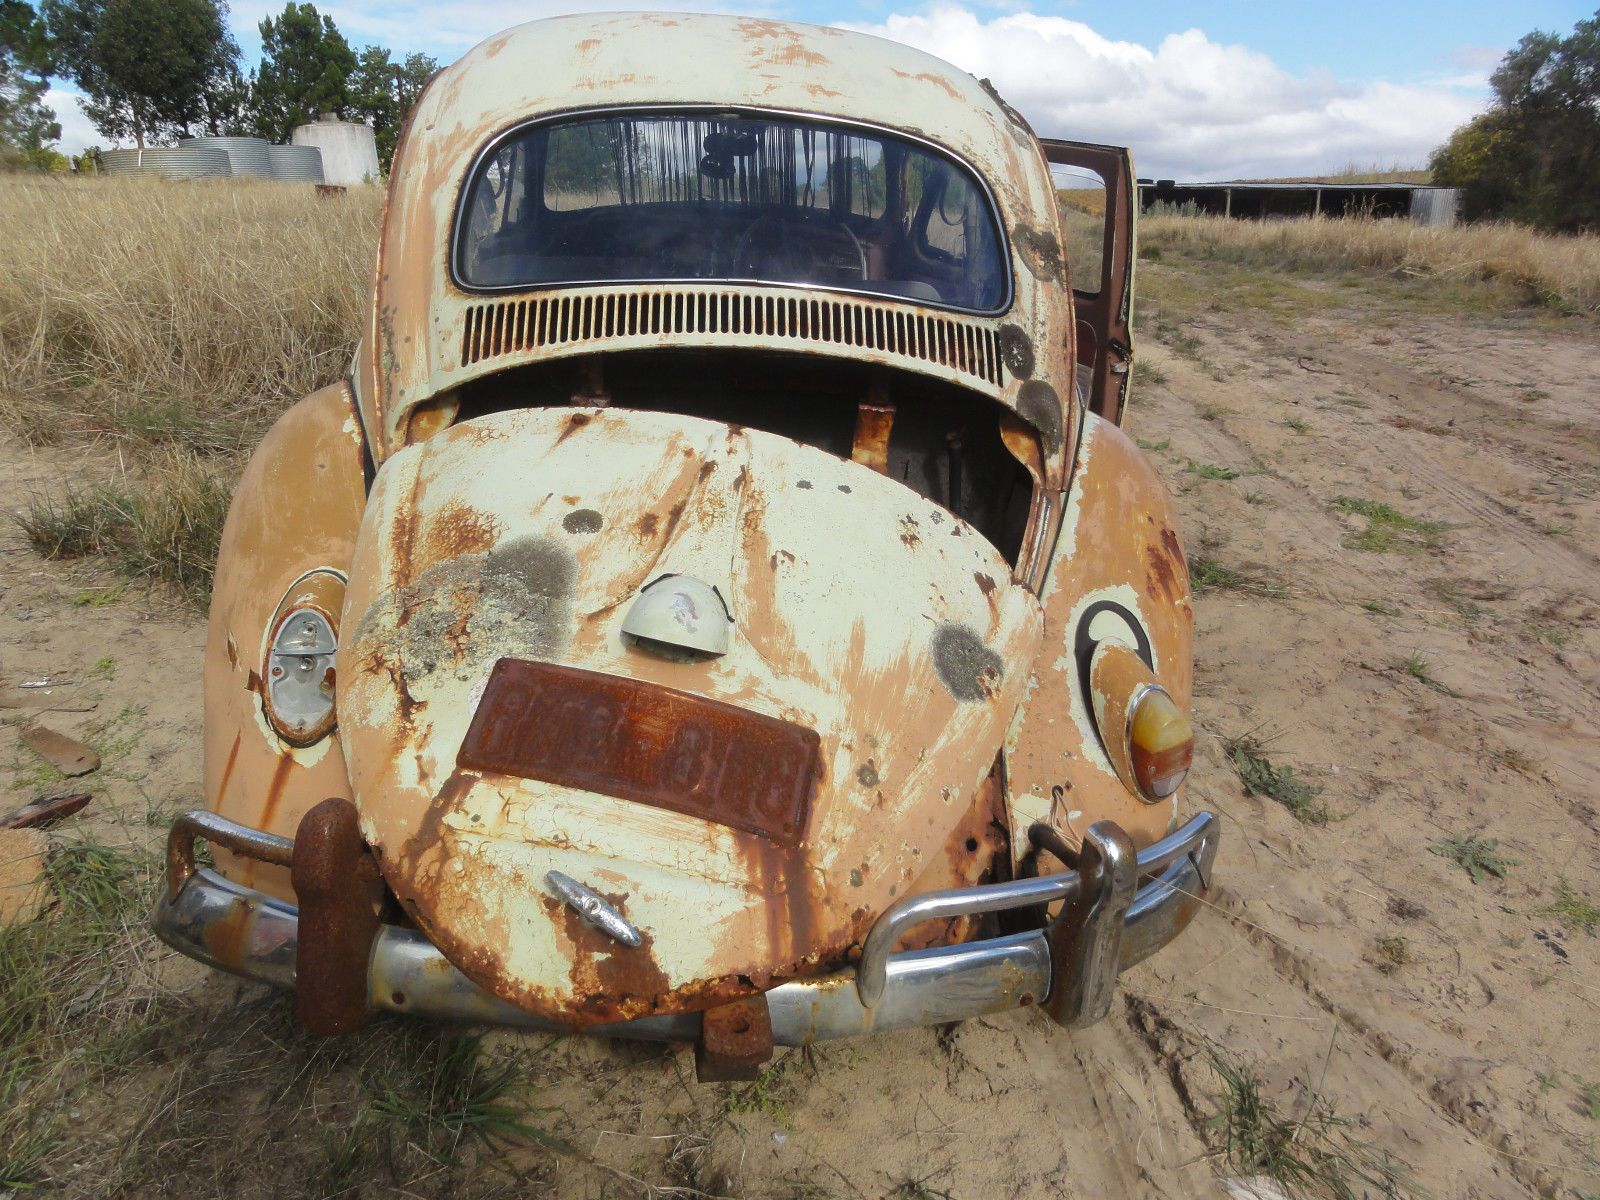 http://www.ebay.com.au/itm/VW-beetle-/152063894689?hash ...